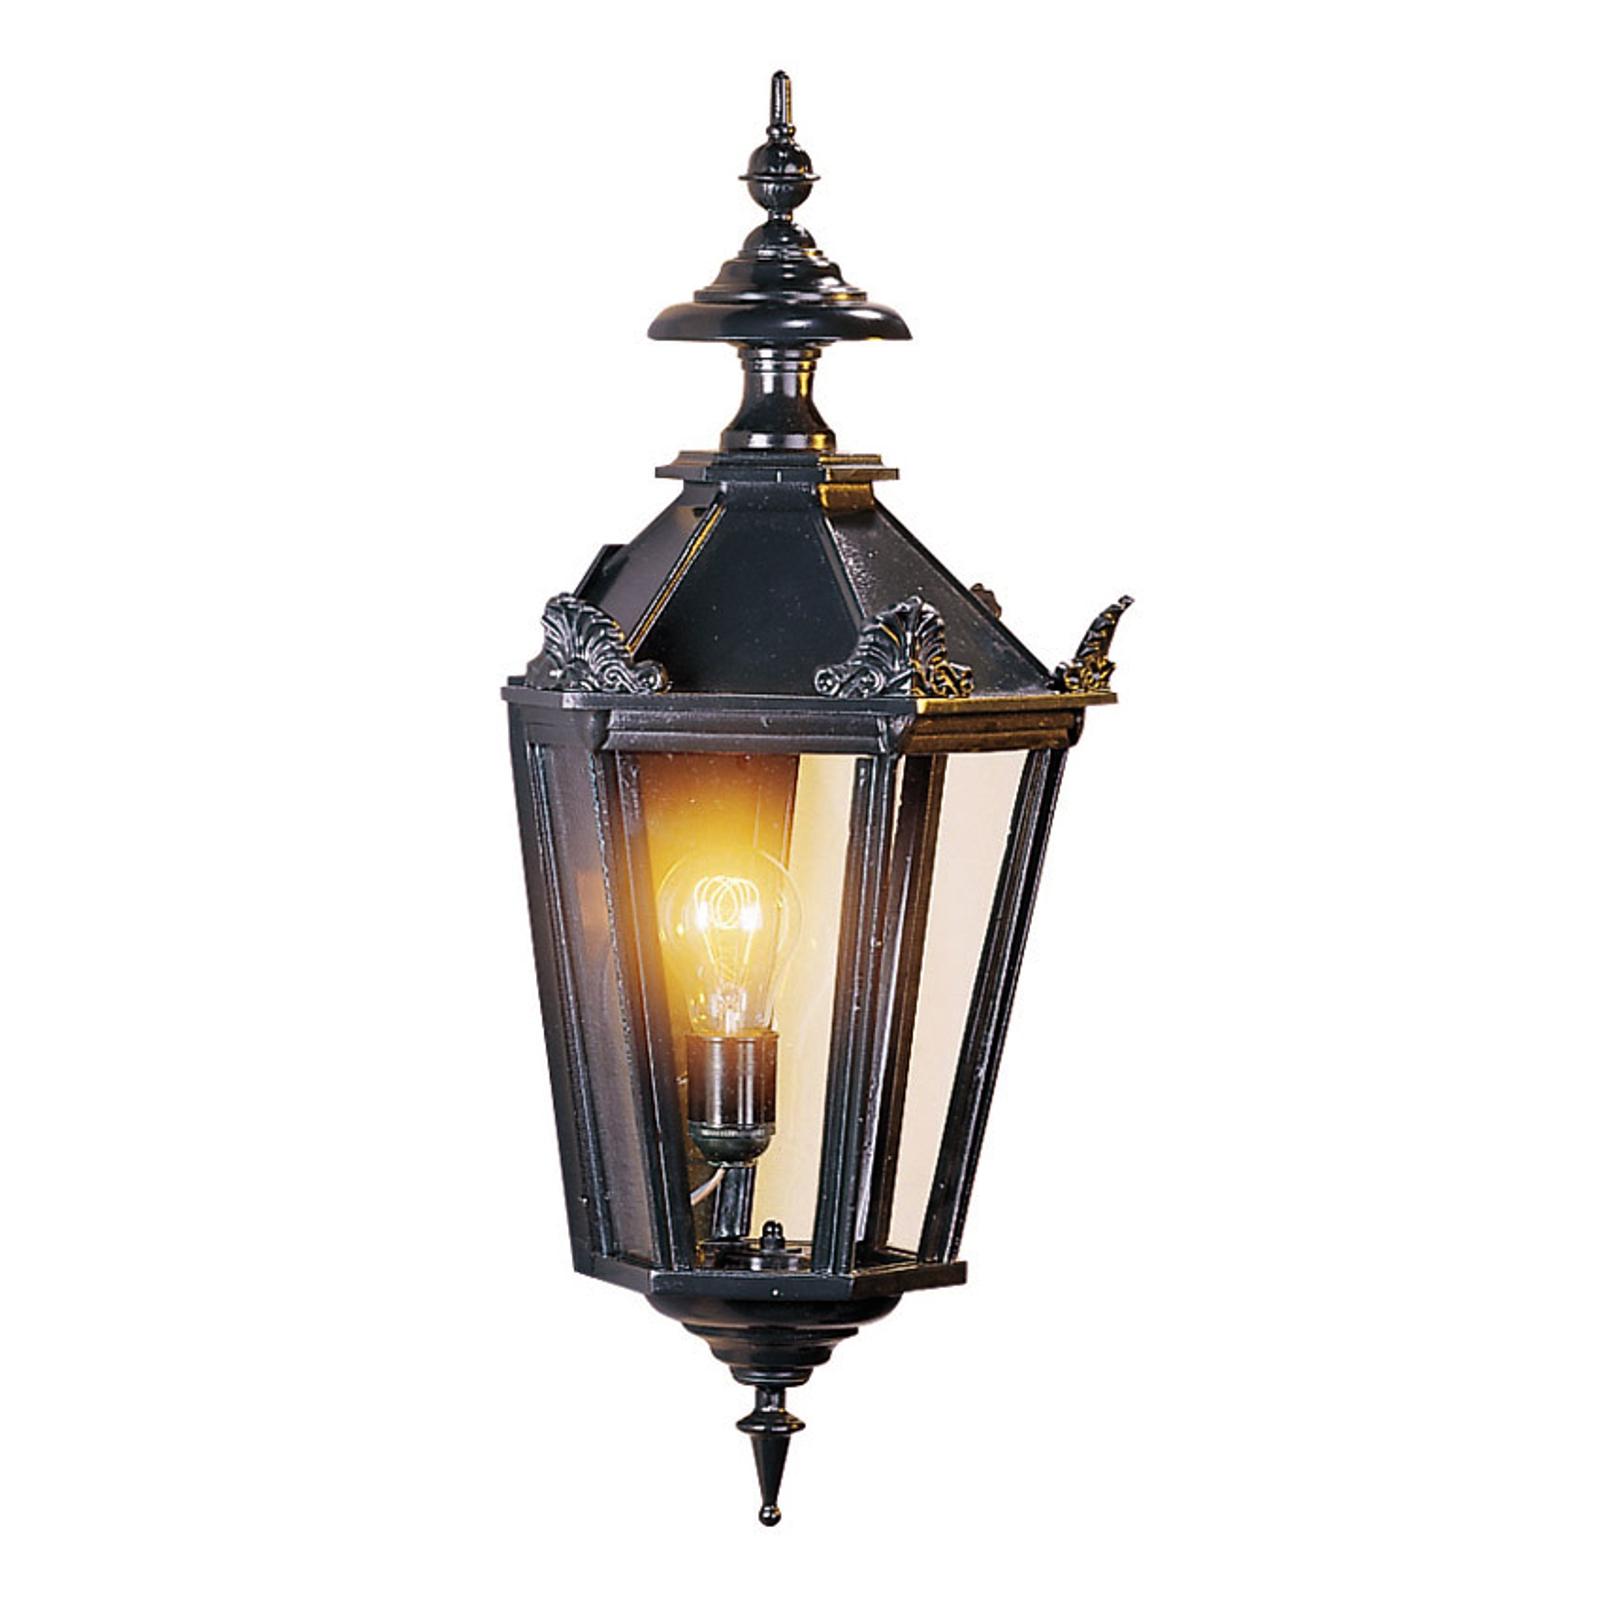 Buitenwandlamp Oxford, zwart